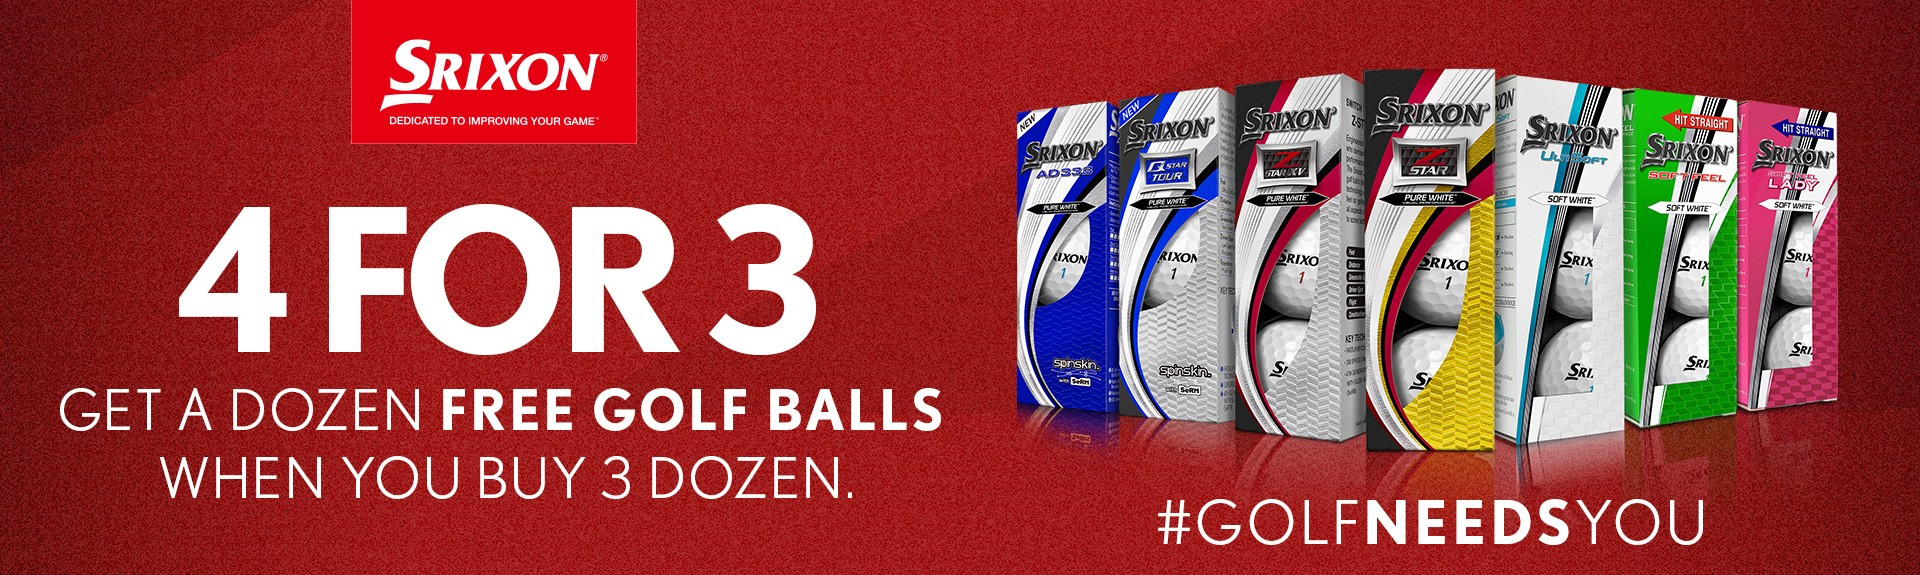 Srixon 4 for 3 Ball Promo